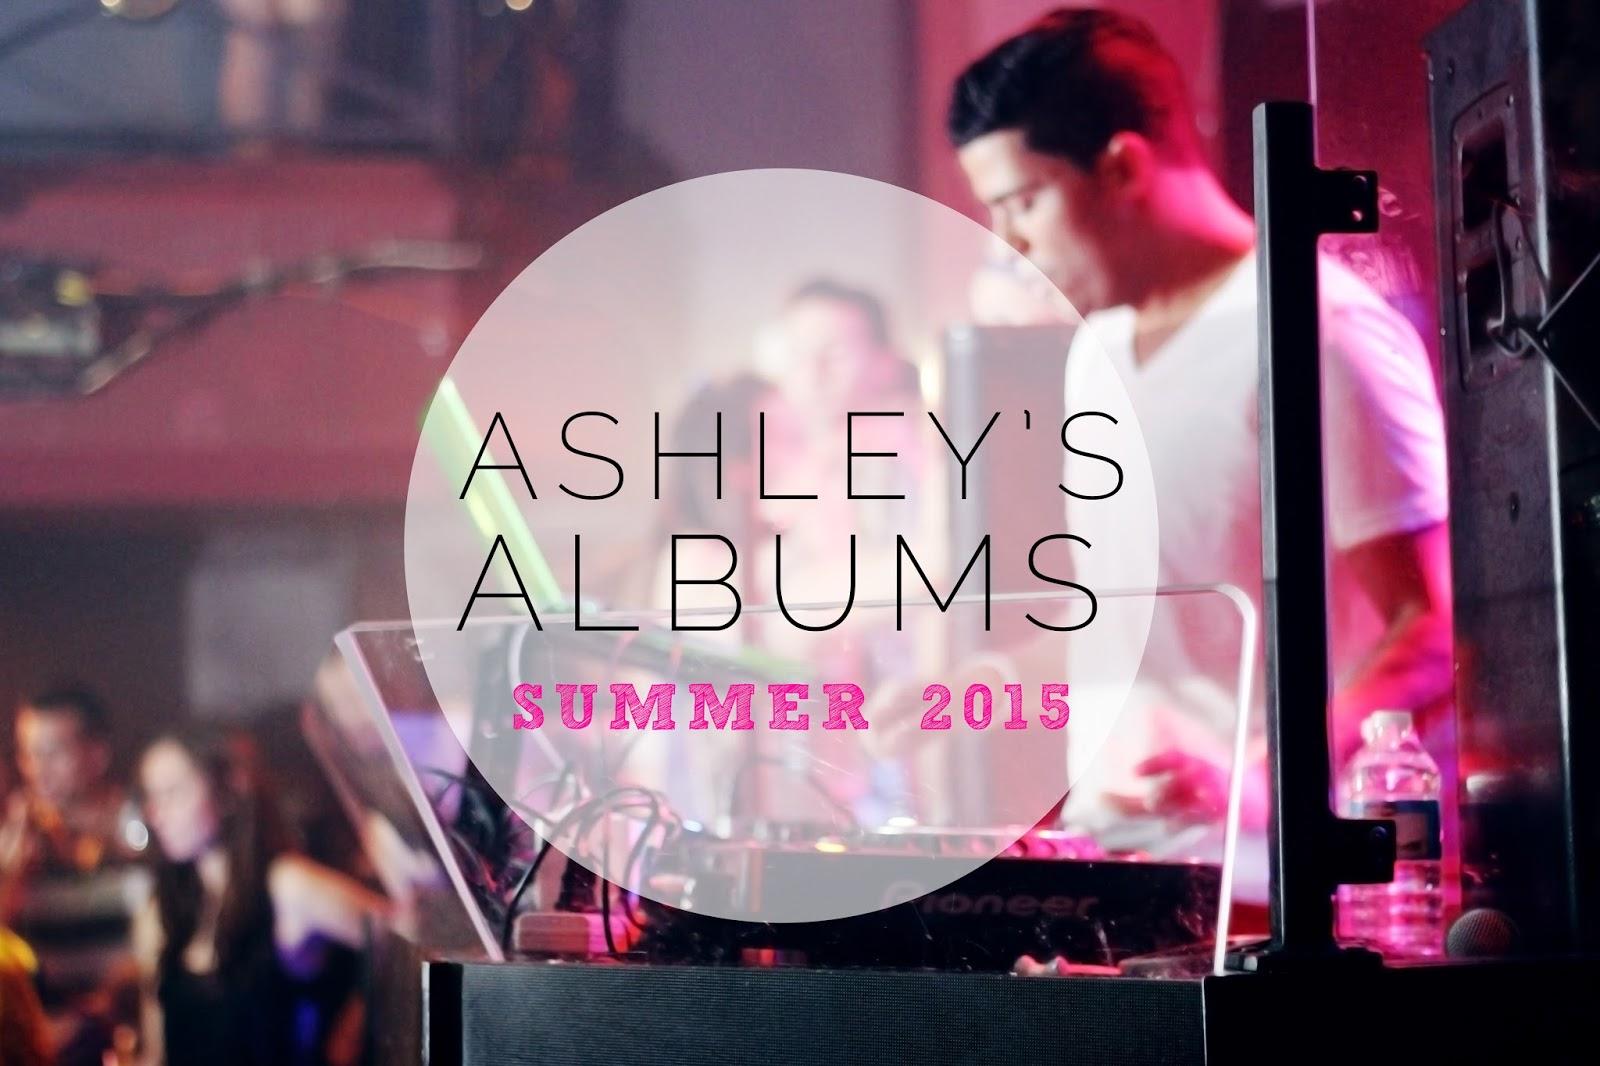 ashley's albums